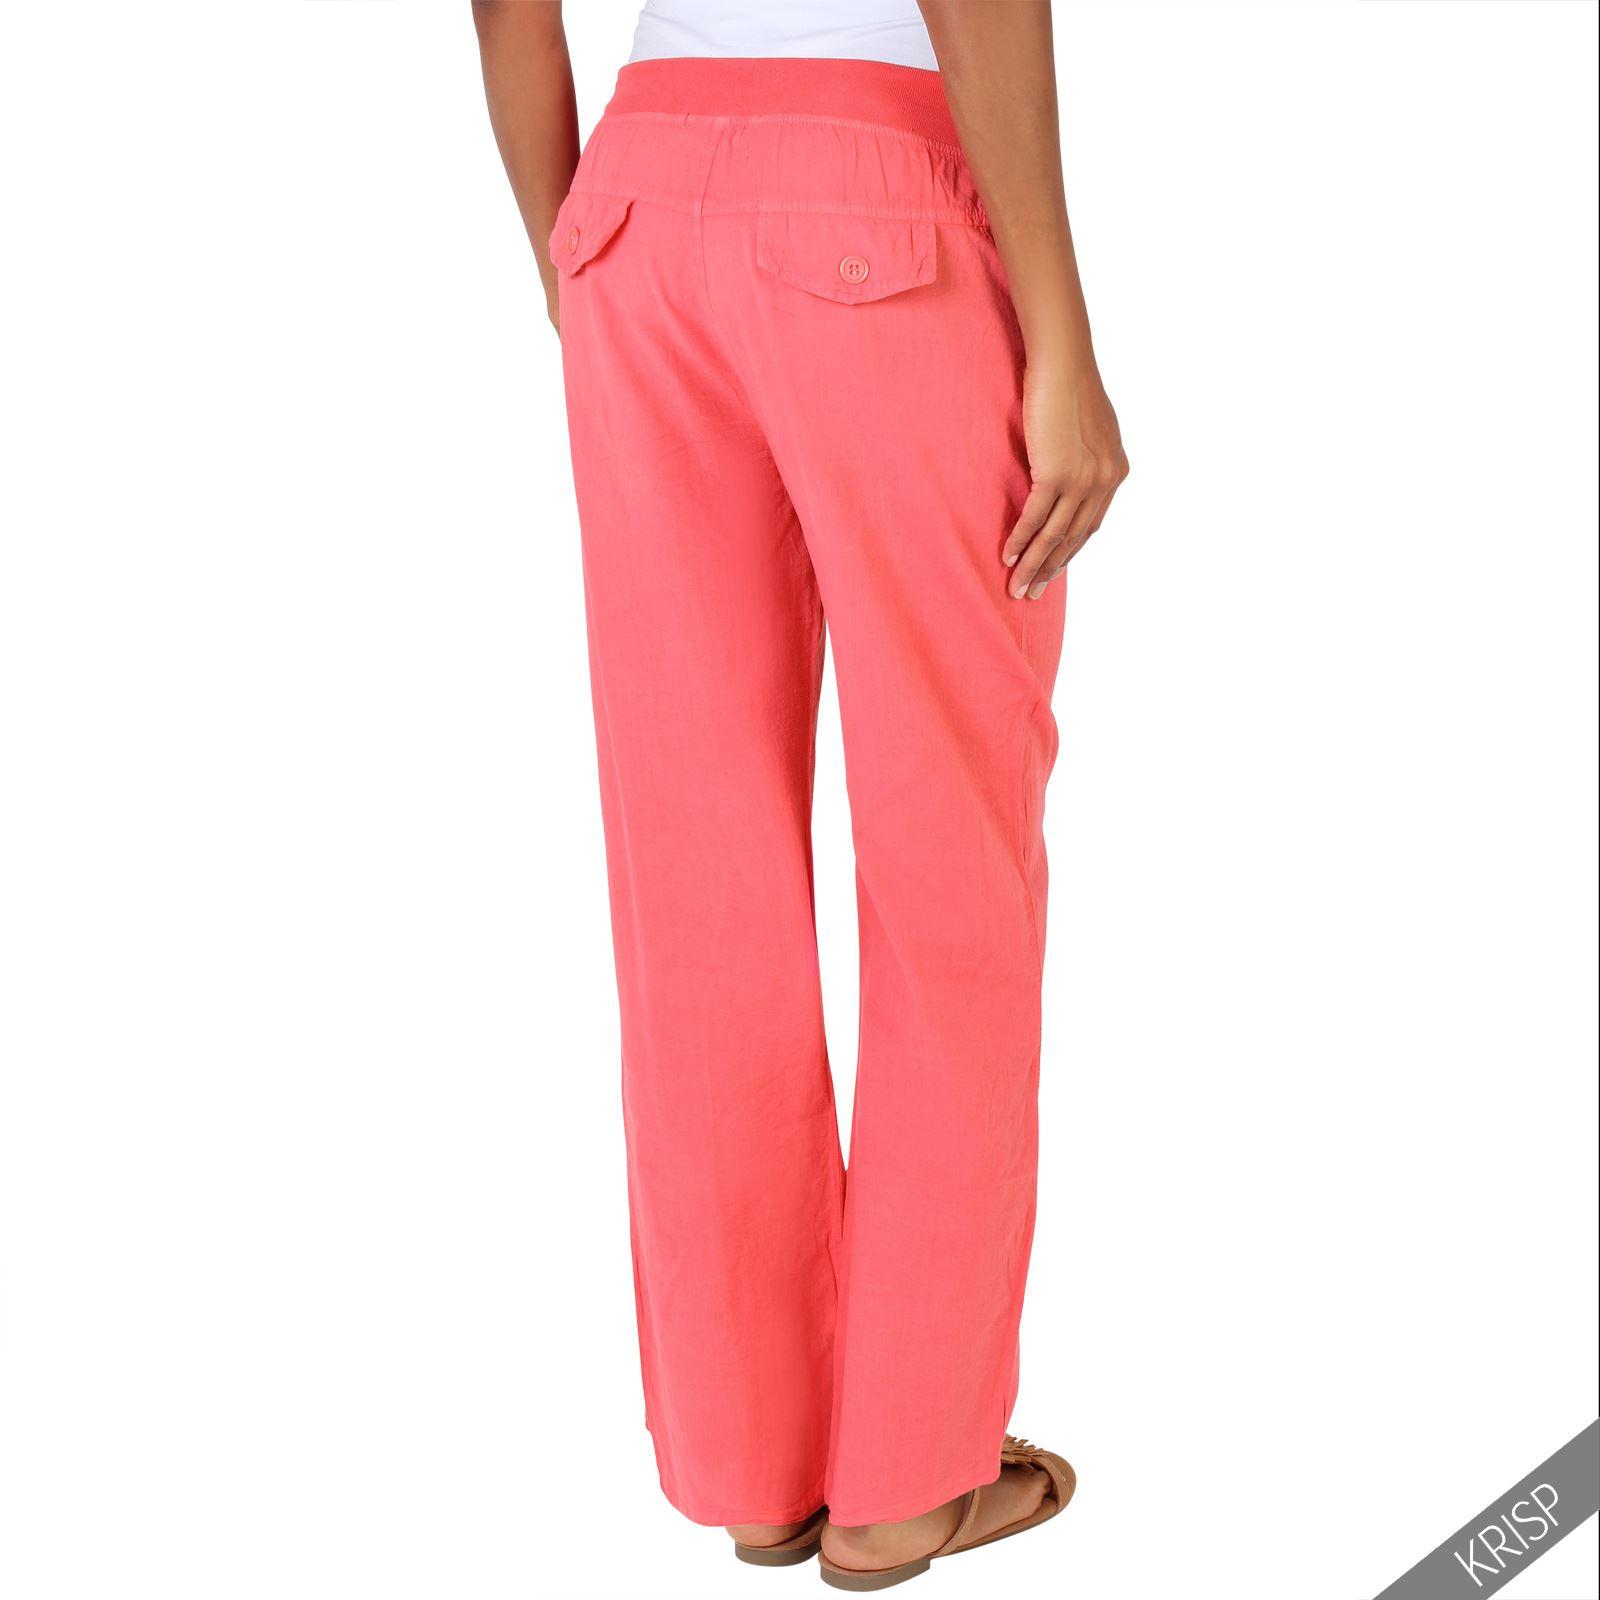 New SCUWLINEN 2019 Vintage Trousers For Women Casual Elastic Waist Long Linen Pants All Match Women ...